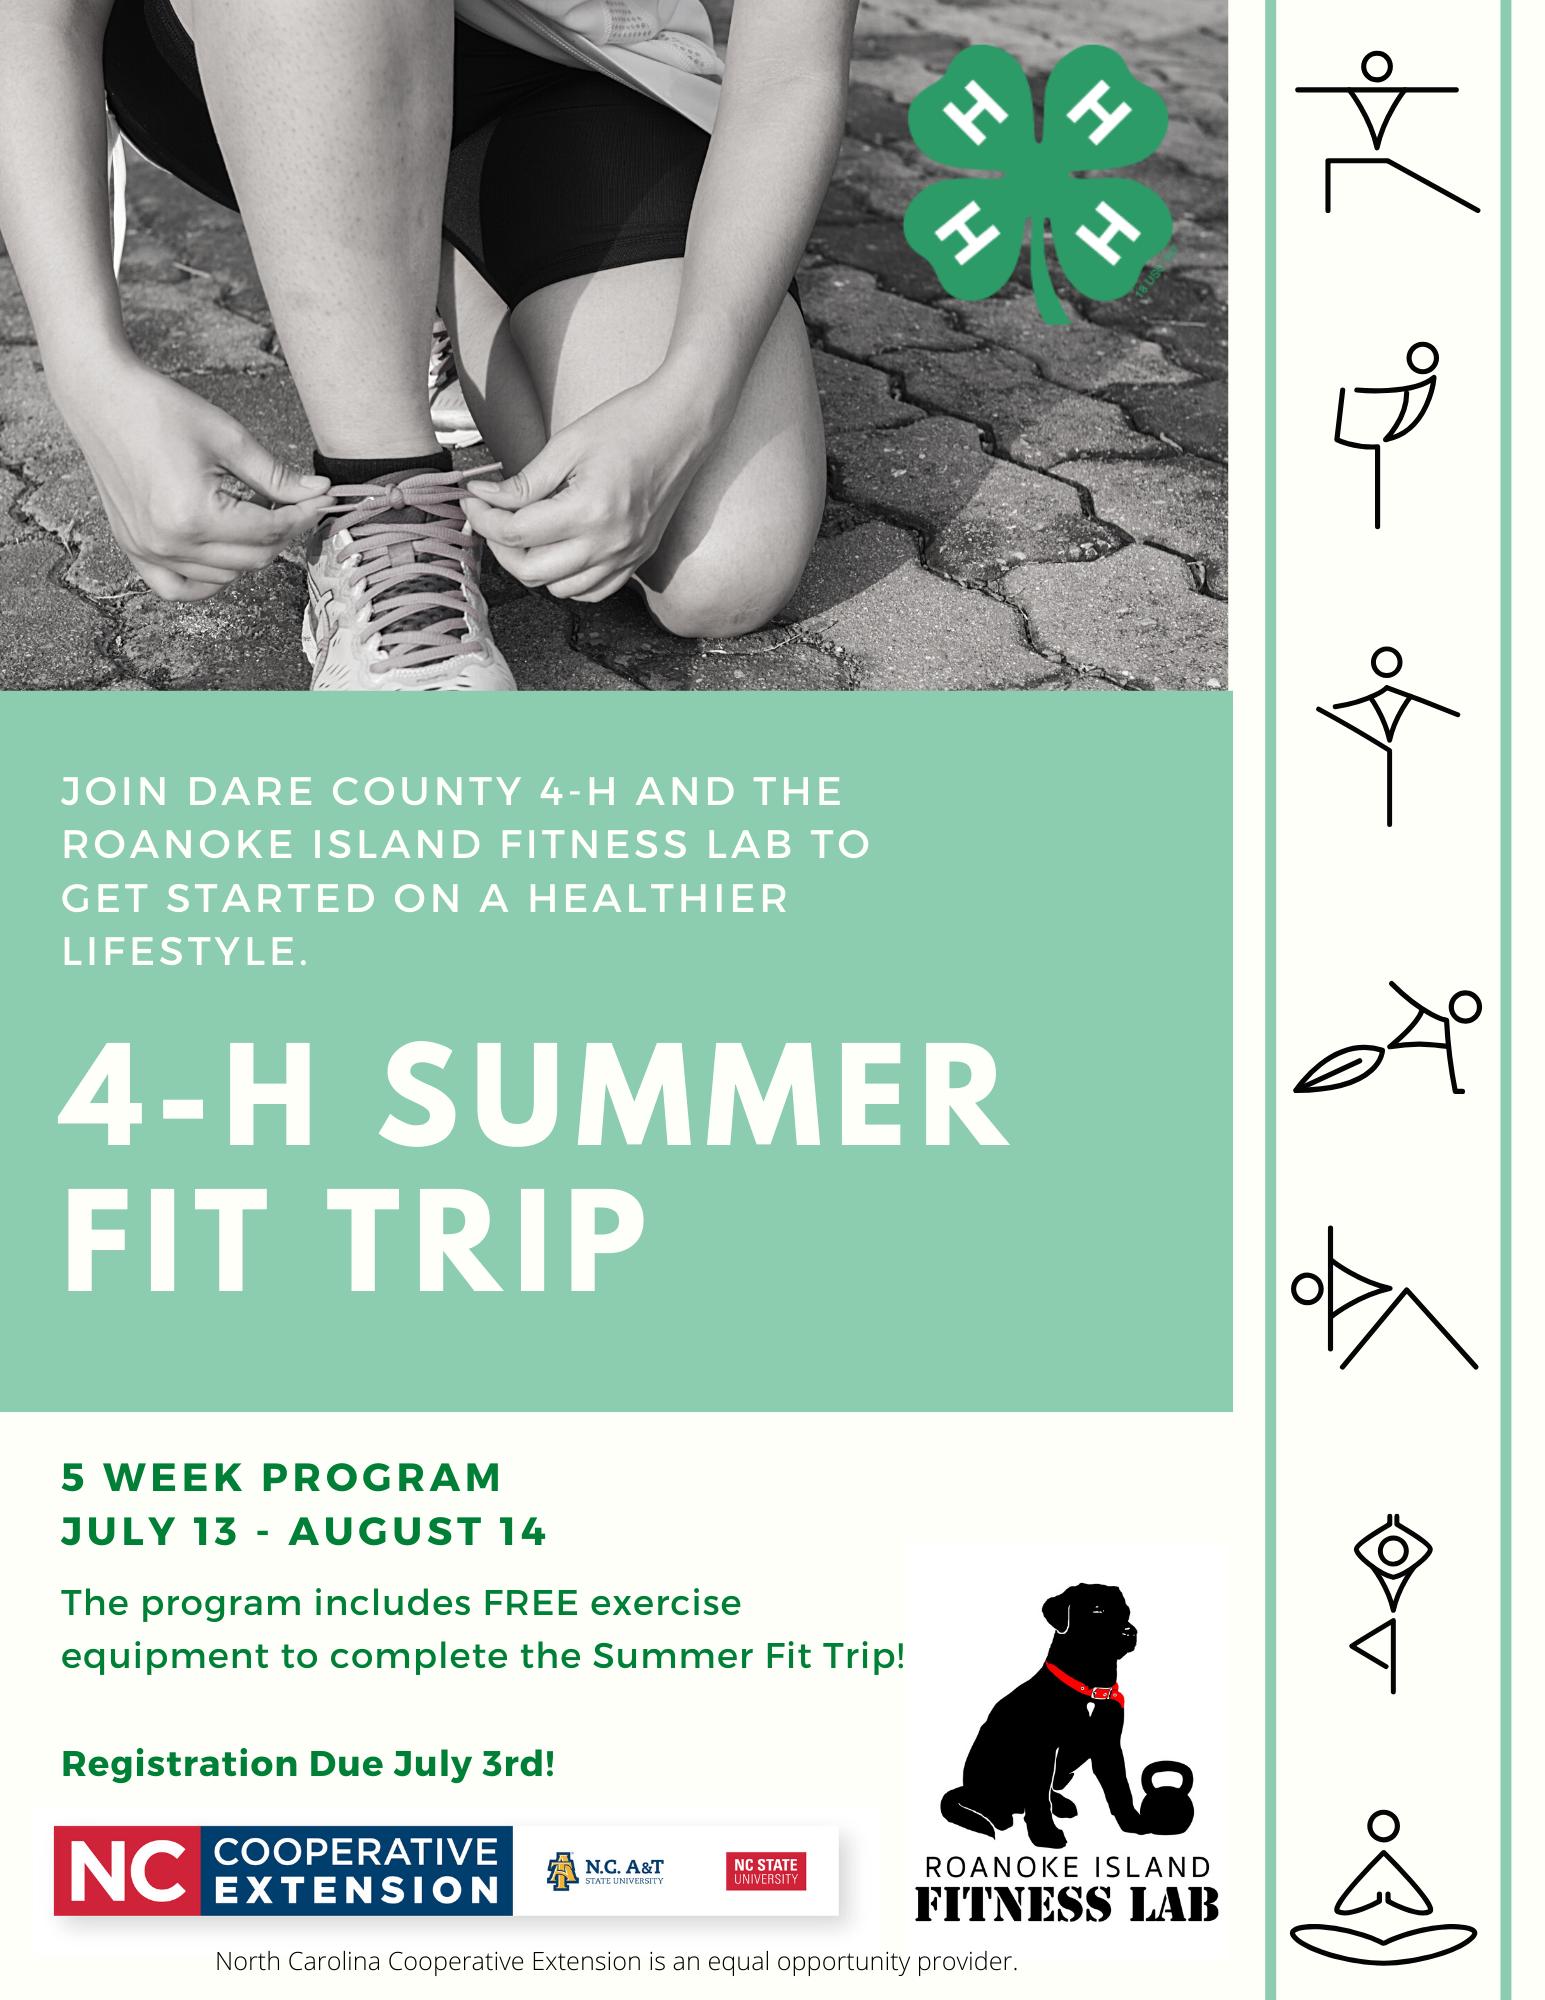 4-H Summer Fit Trip